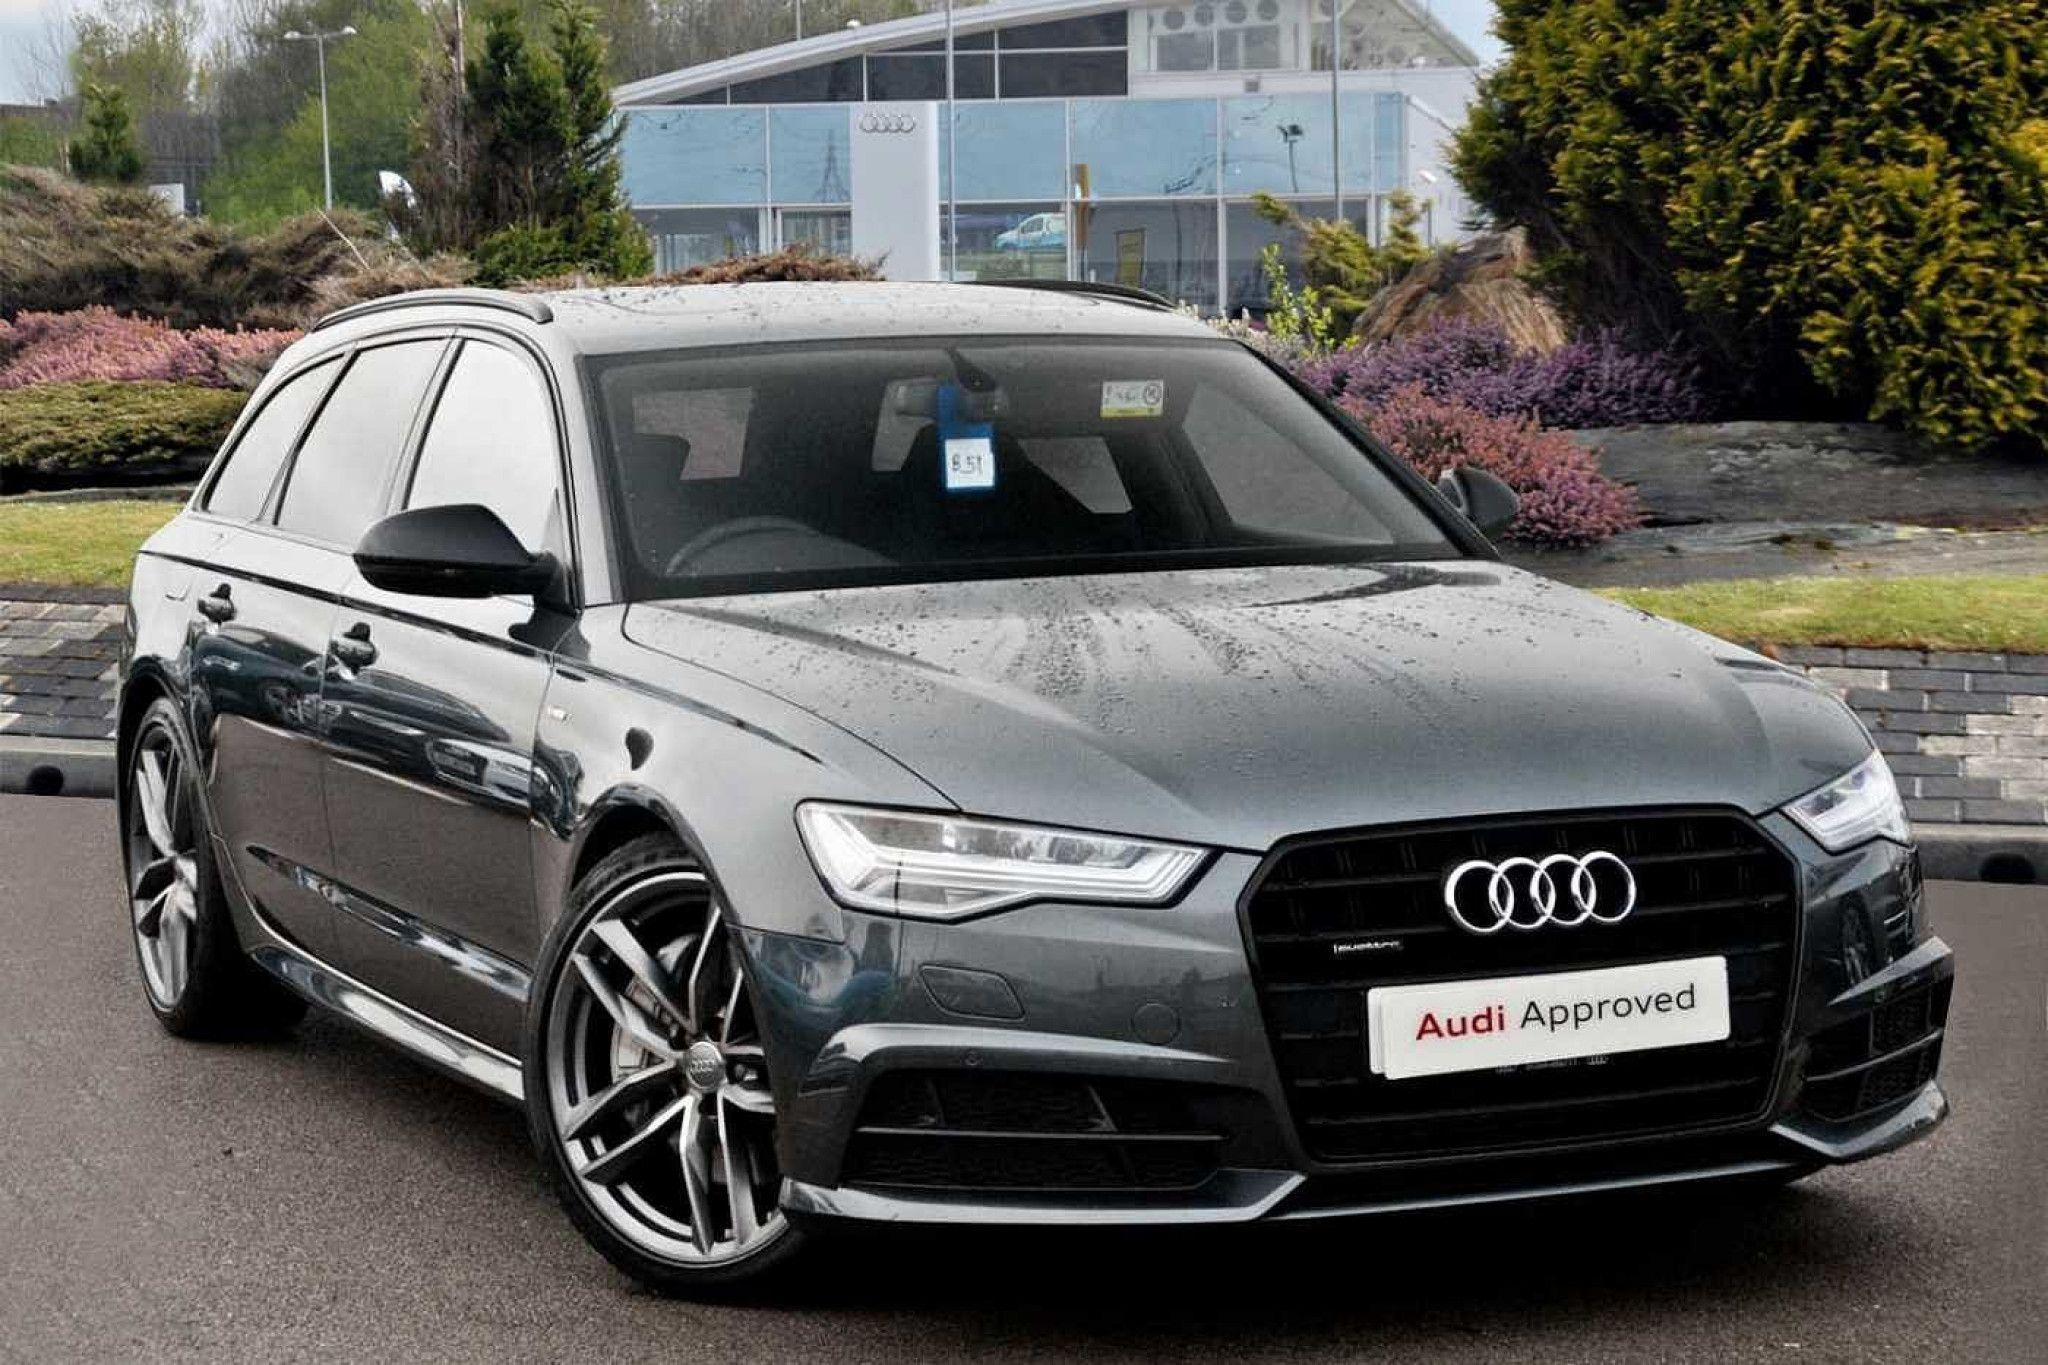 Audi A6 Avant Avant Black Edition 3 0 Tdi Quattro 320 Ps Tiptronic For Sale Audi A6 Avant Audi A6 Audi